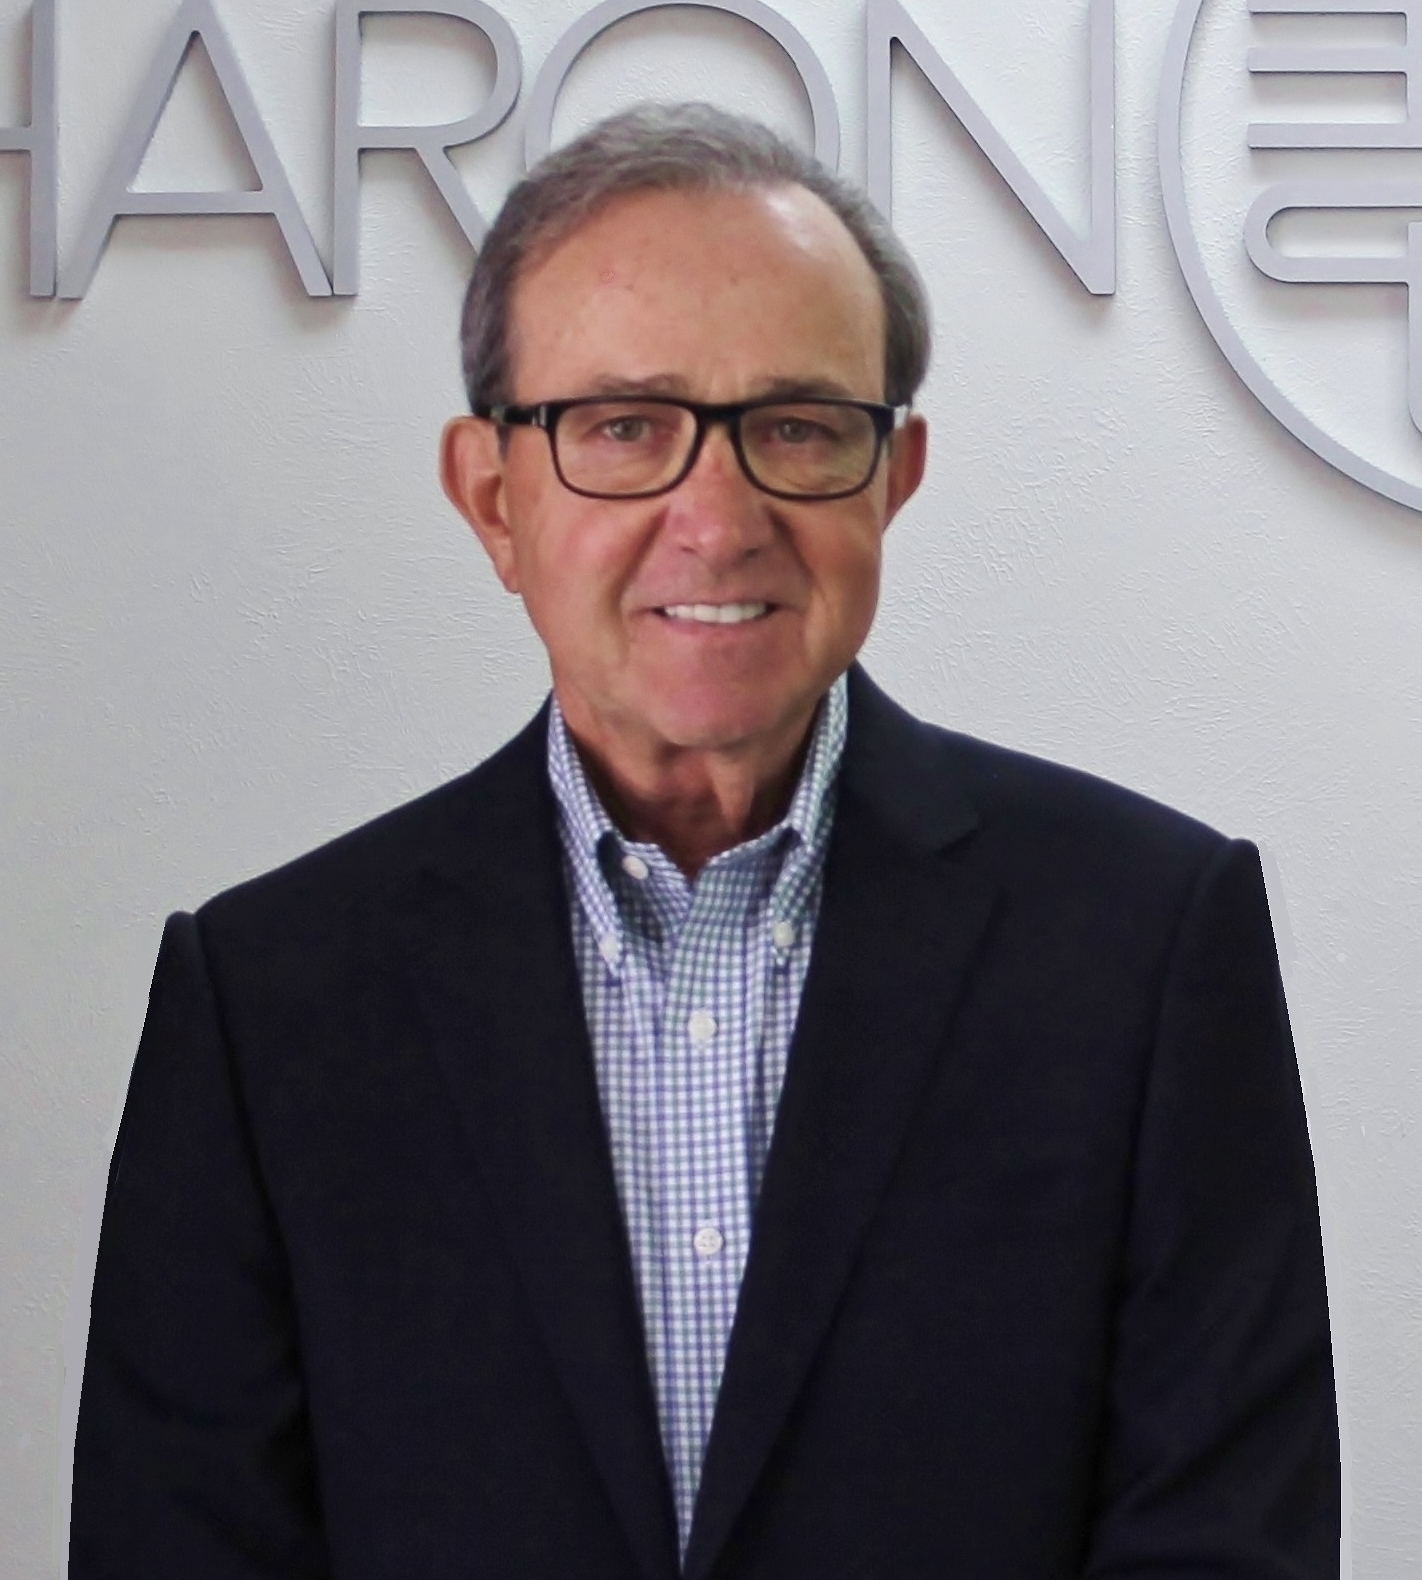 Sam klapholz - Executive Vice President